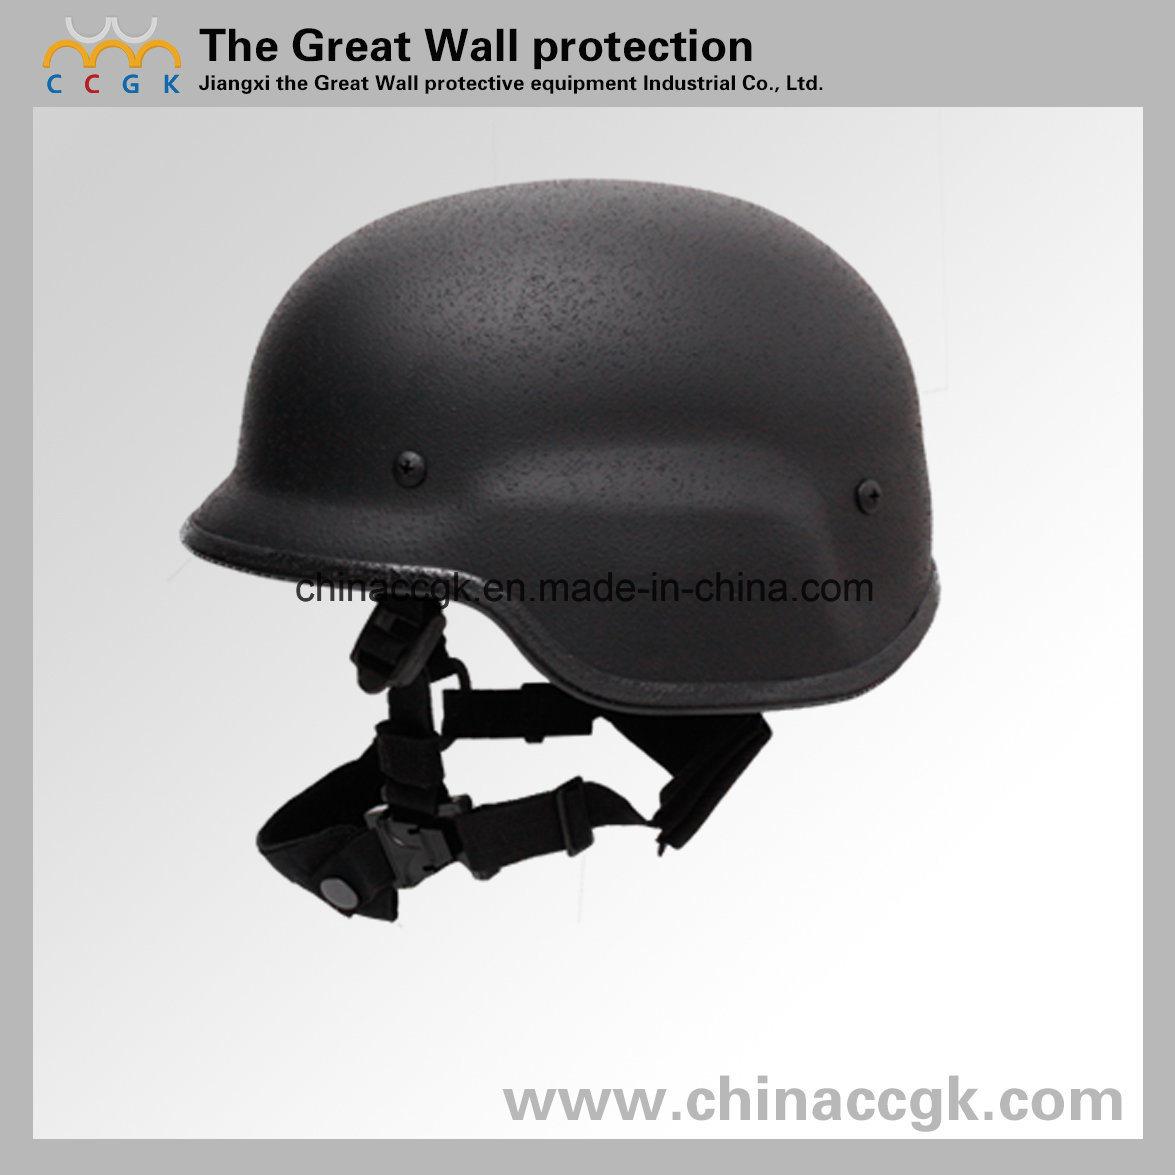 M88 Anti-Riot Helmet